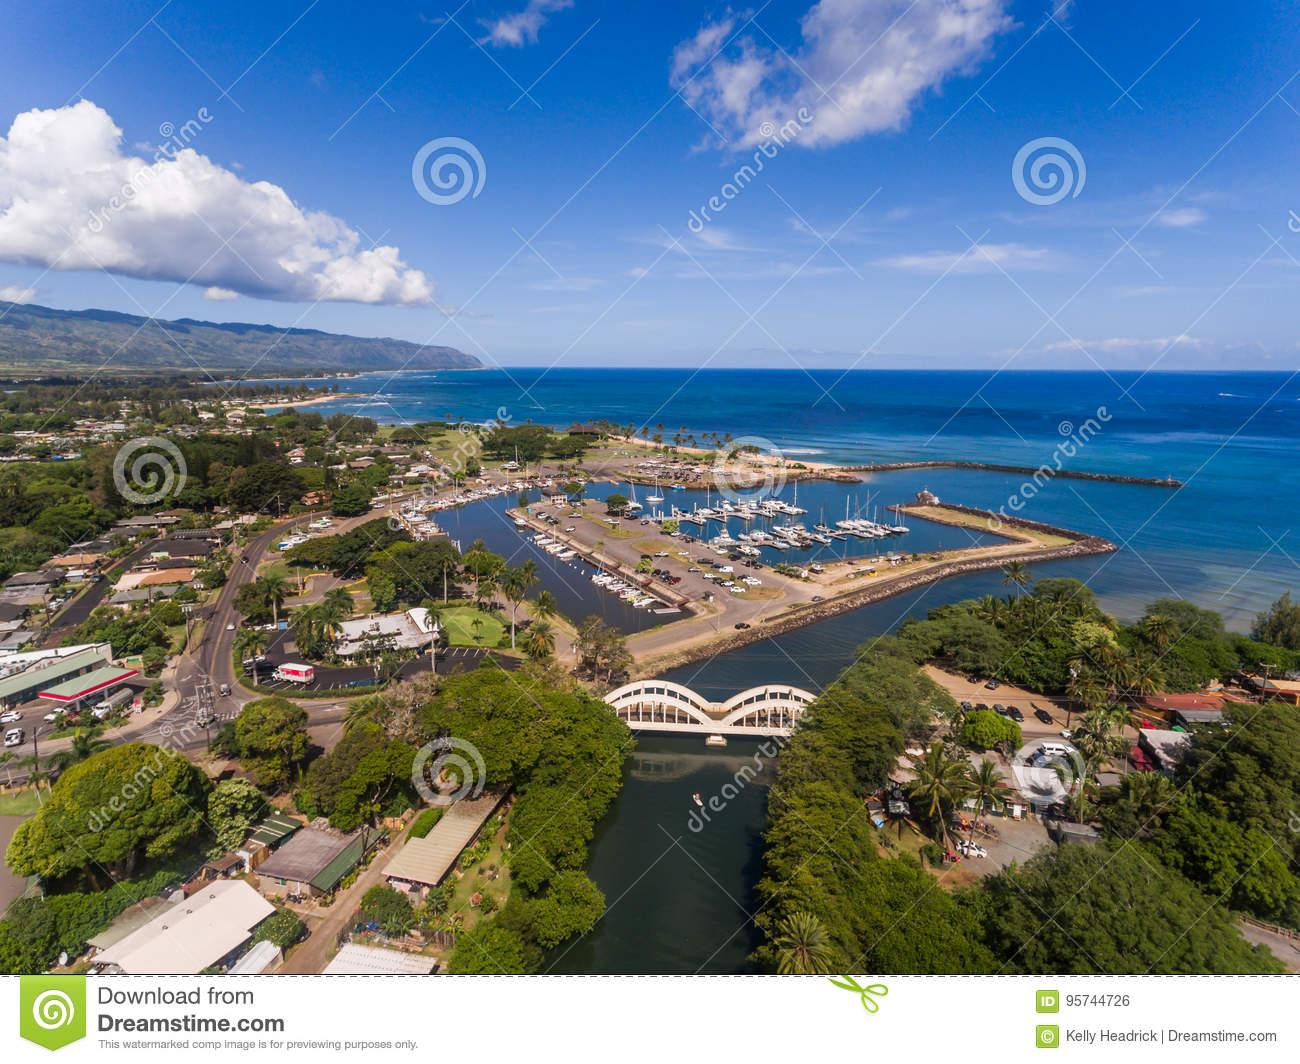 Name:  aerial-view-haleiwa-town-harbor-small-boat-anahulu-river-bridge-95744726.jpg Views: 800 Size:  241.9 KB